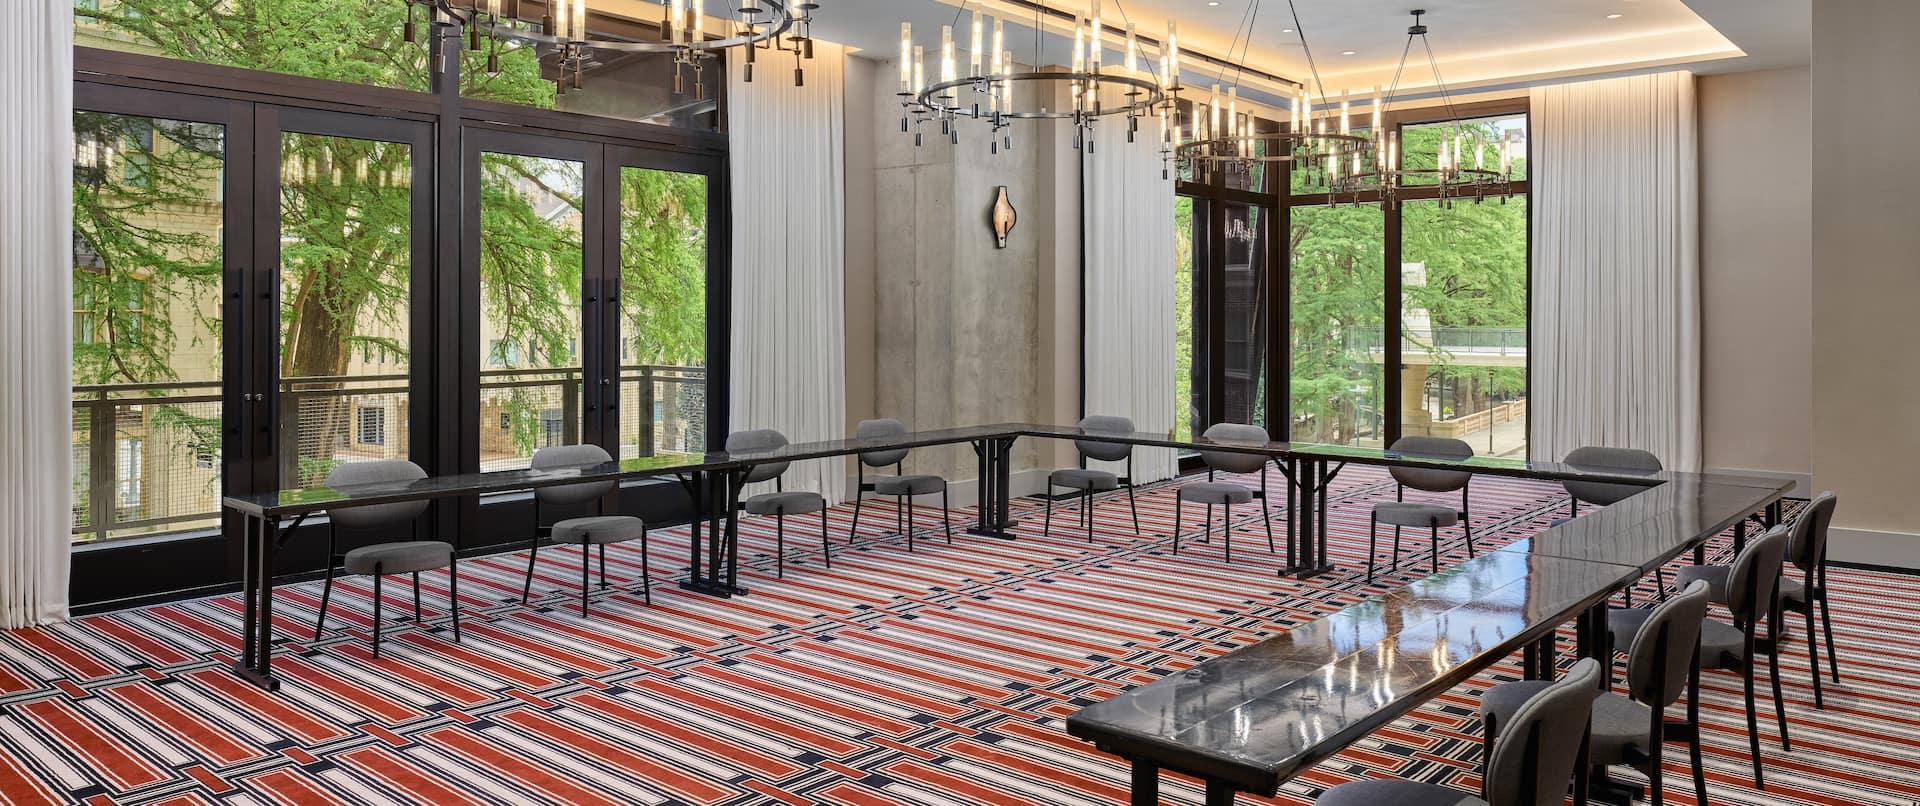 Las Ramas Meeting Room with Balcony Riverwalk View